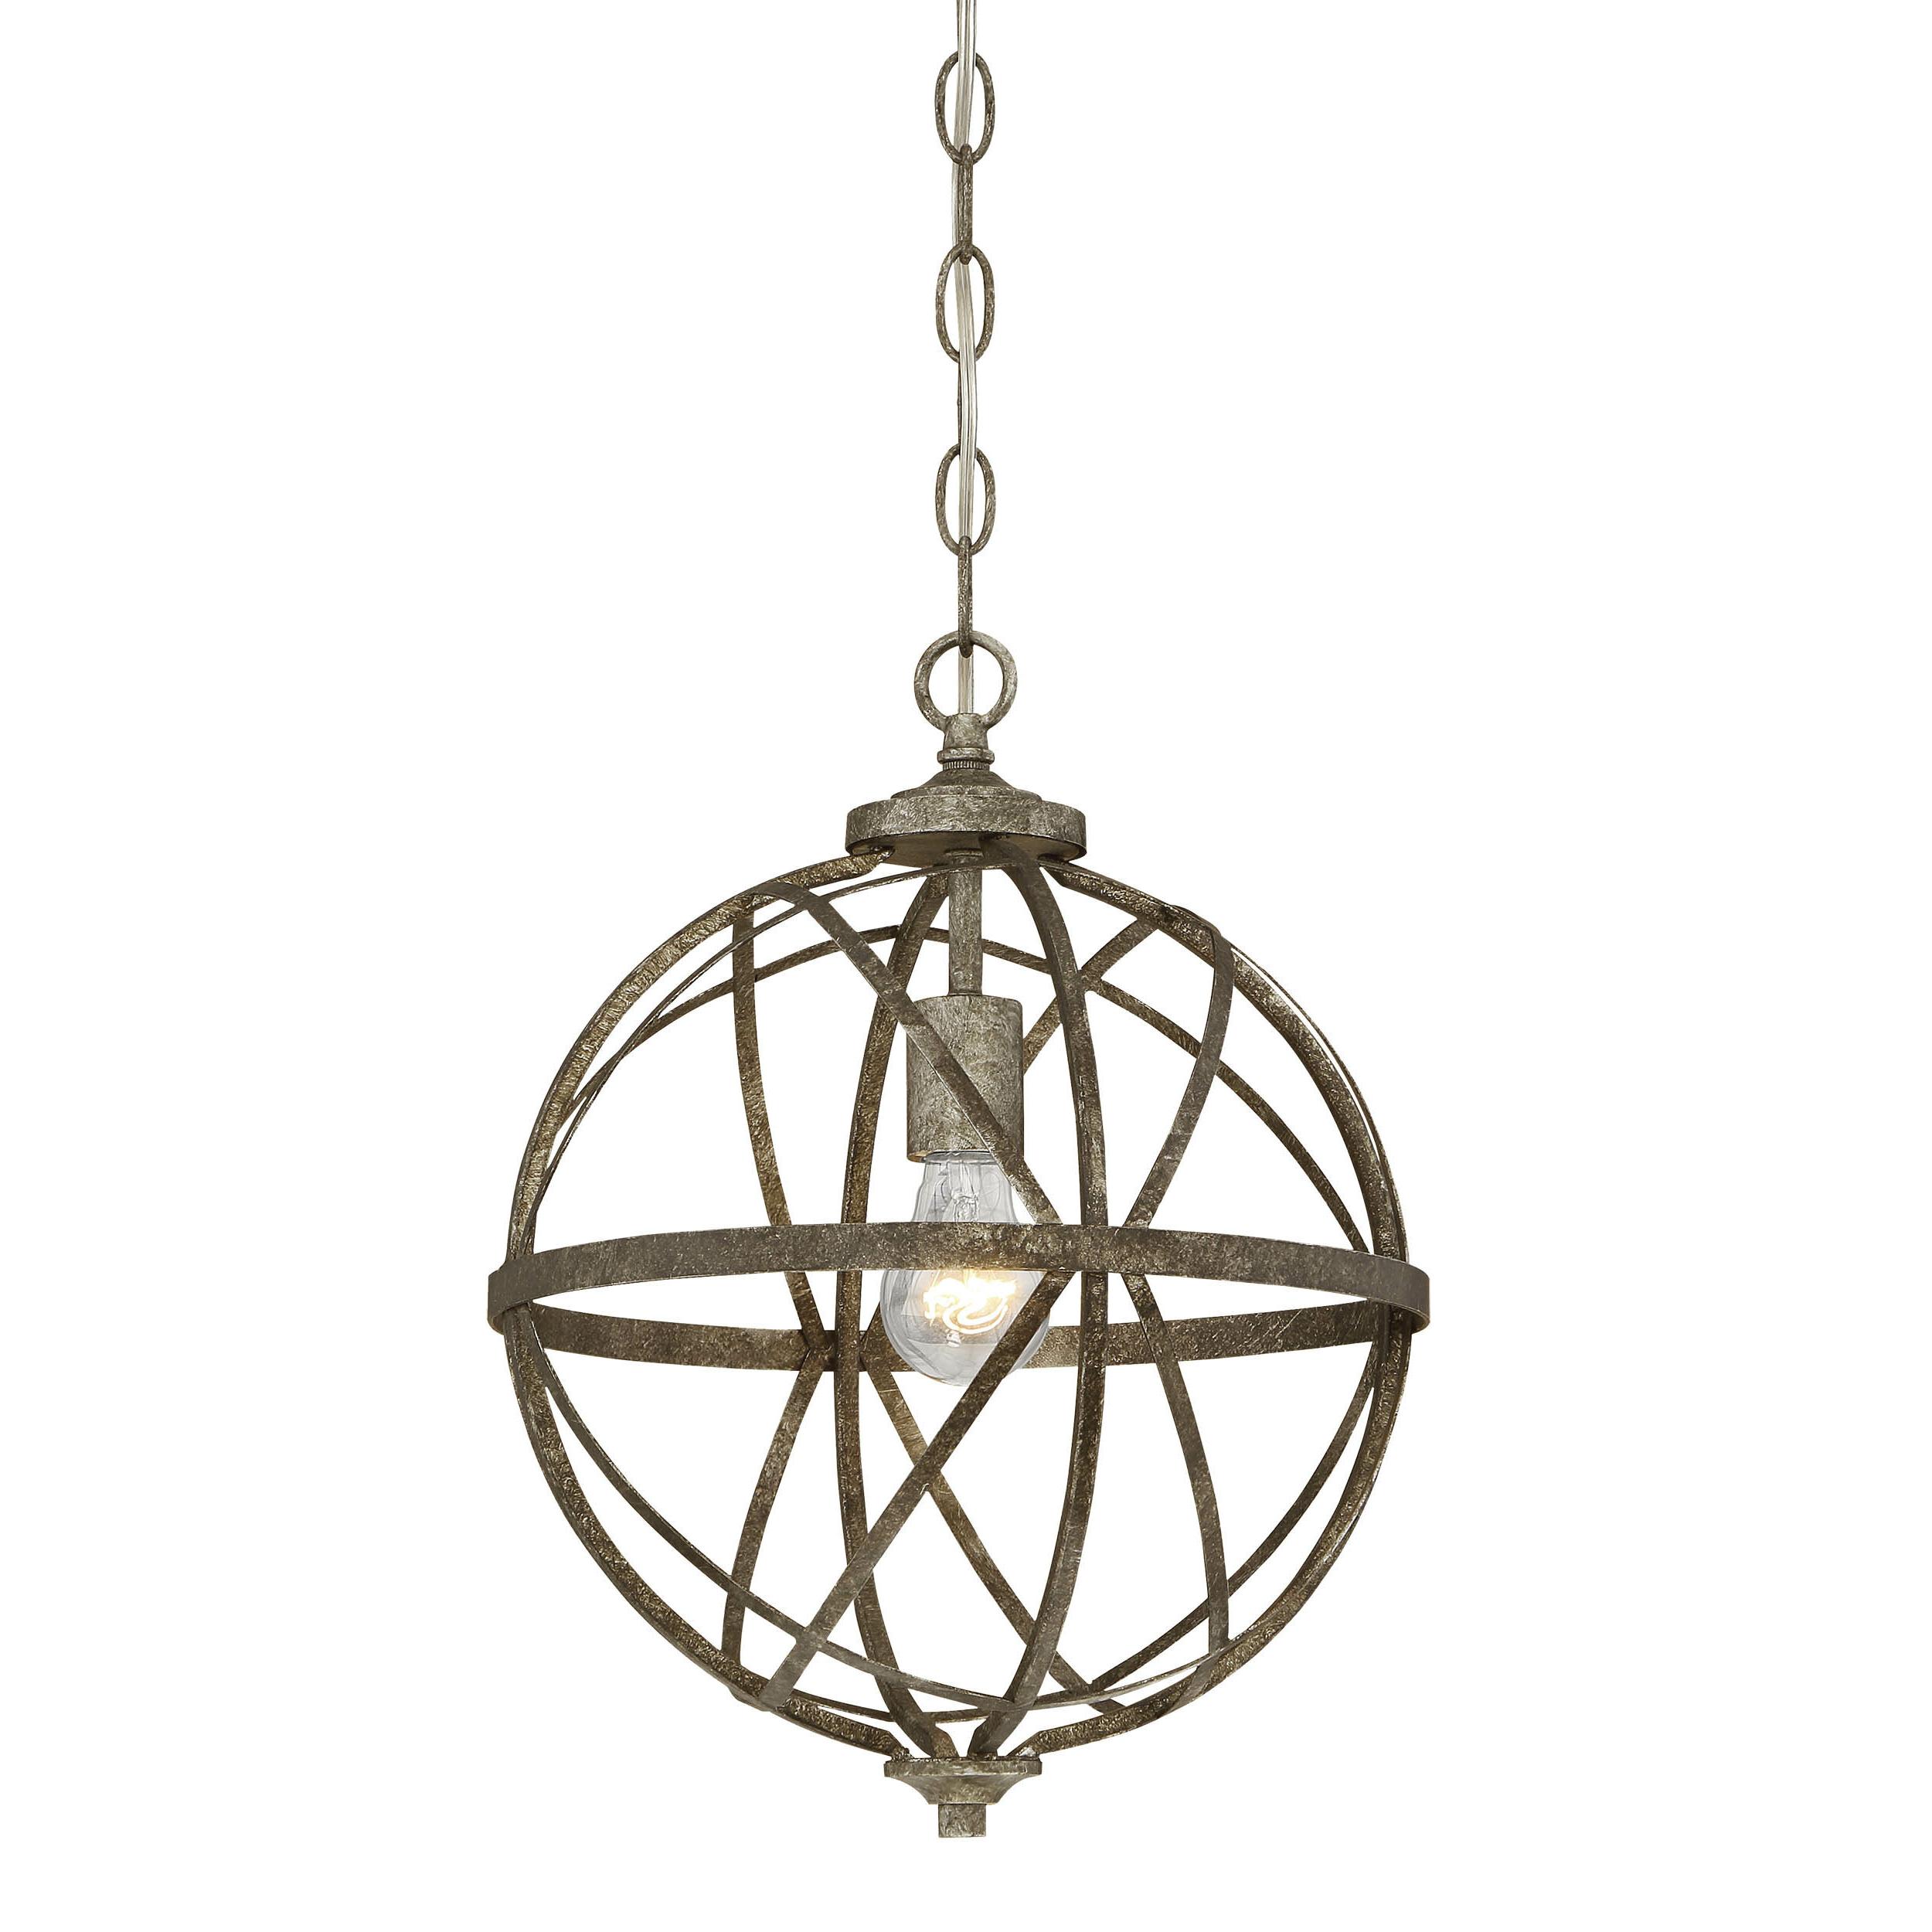 Latest Irwin 1 Light Single Globe Pendants With Regard To World Menagerie Rodden 1 Light Single Globe Pendant (View 9 of 25)